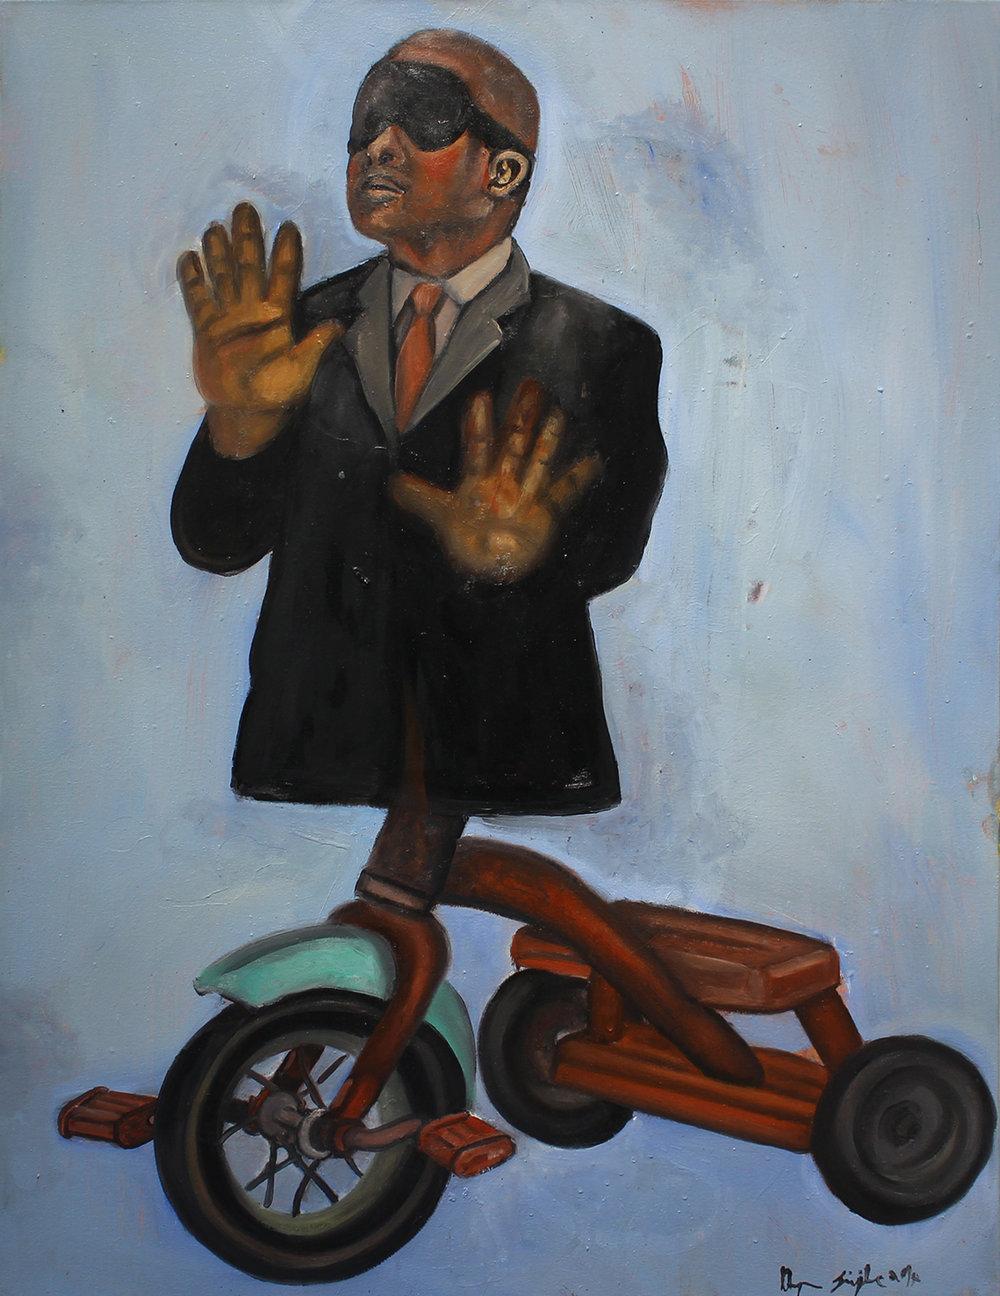 Khaya Sineyile  Turning a Blind Eye, 2017  Oil on canvas  100 x 75 cm